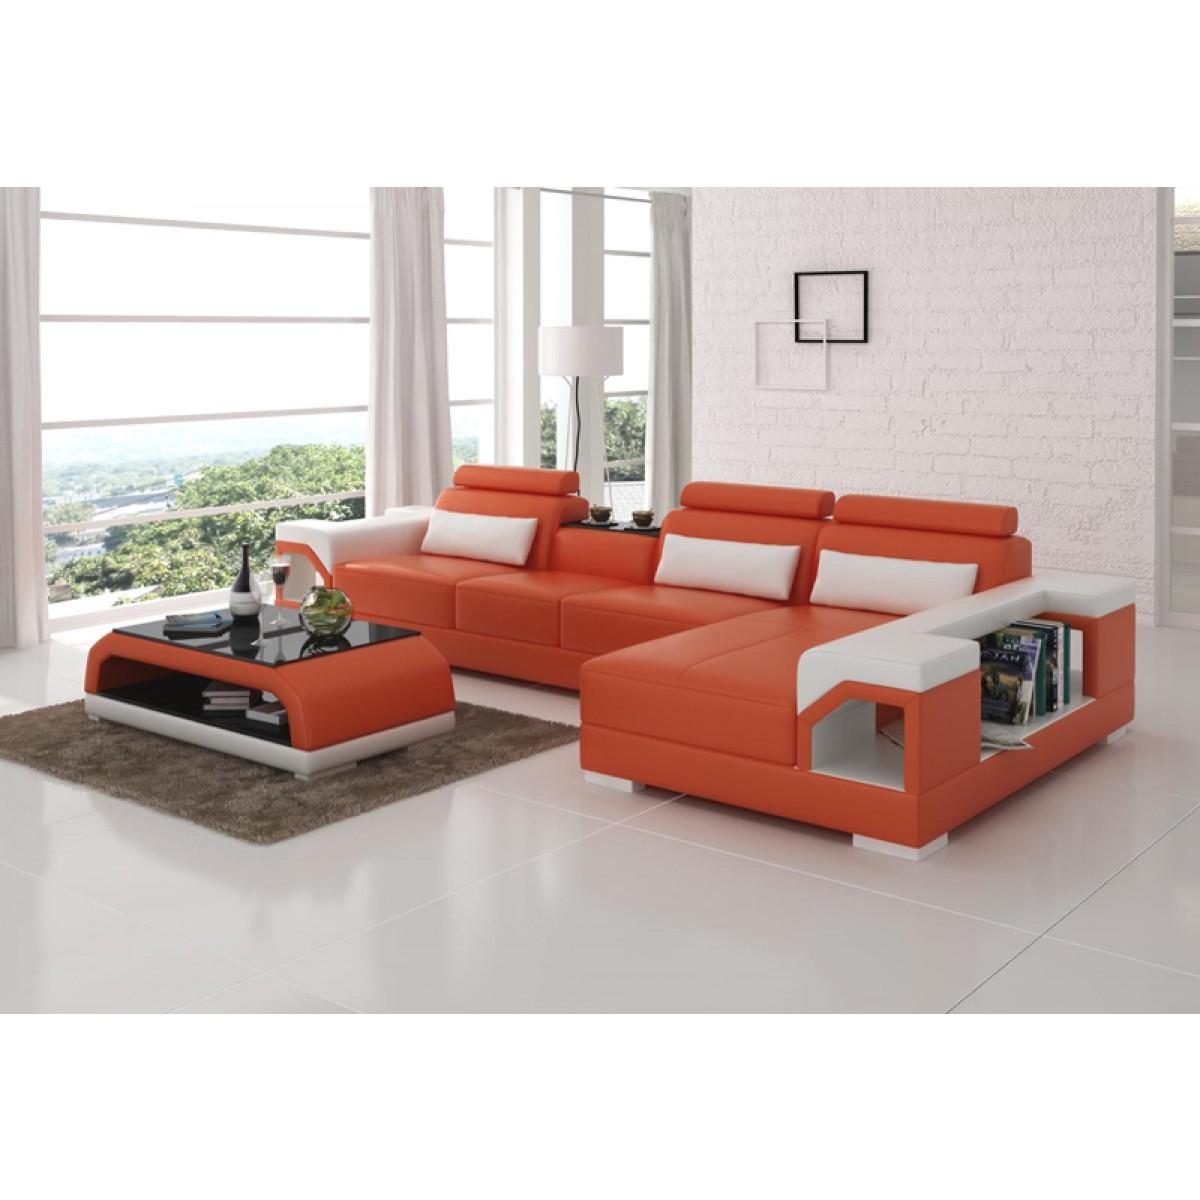 canap d 39 angle en cuir nimes option lit convertible pop design. Black Bedroom Furniture Sets. Home Design Ideas